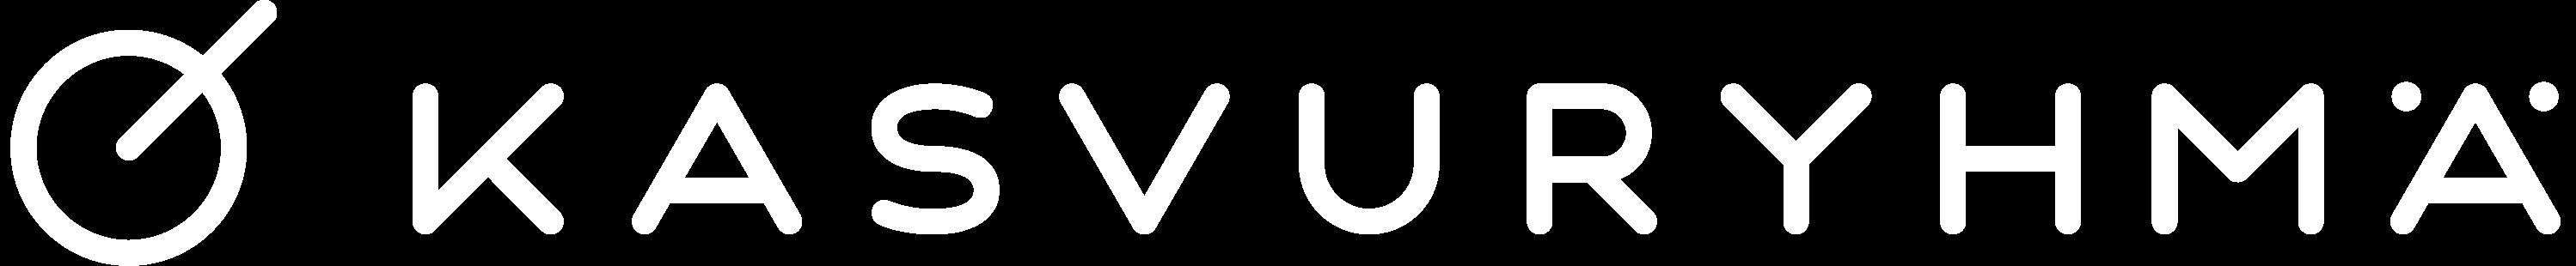 Kasvuryhmä_logo_fi_horizontal_white